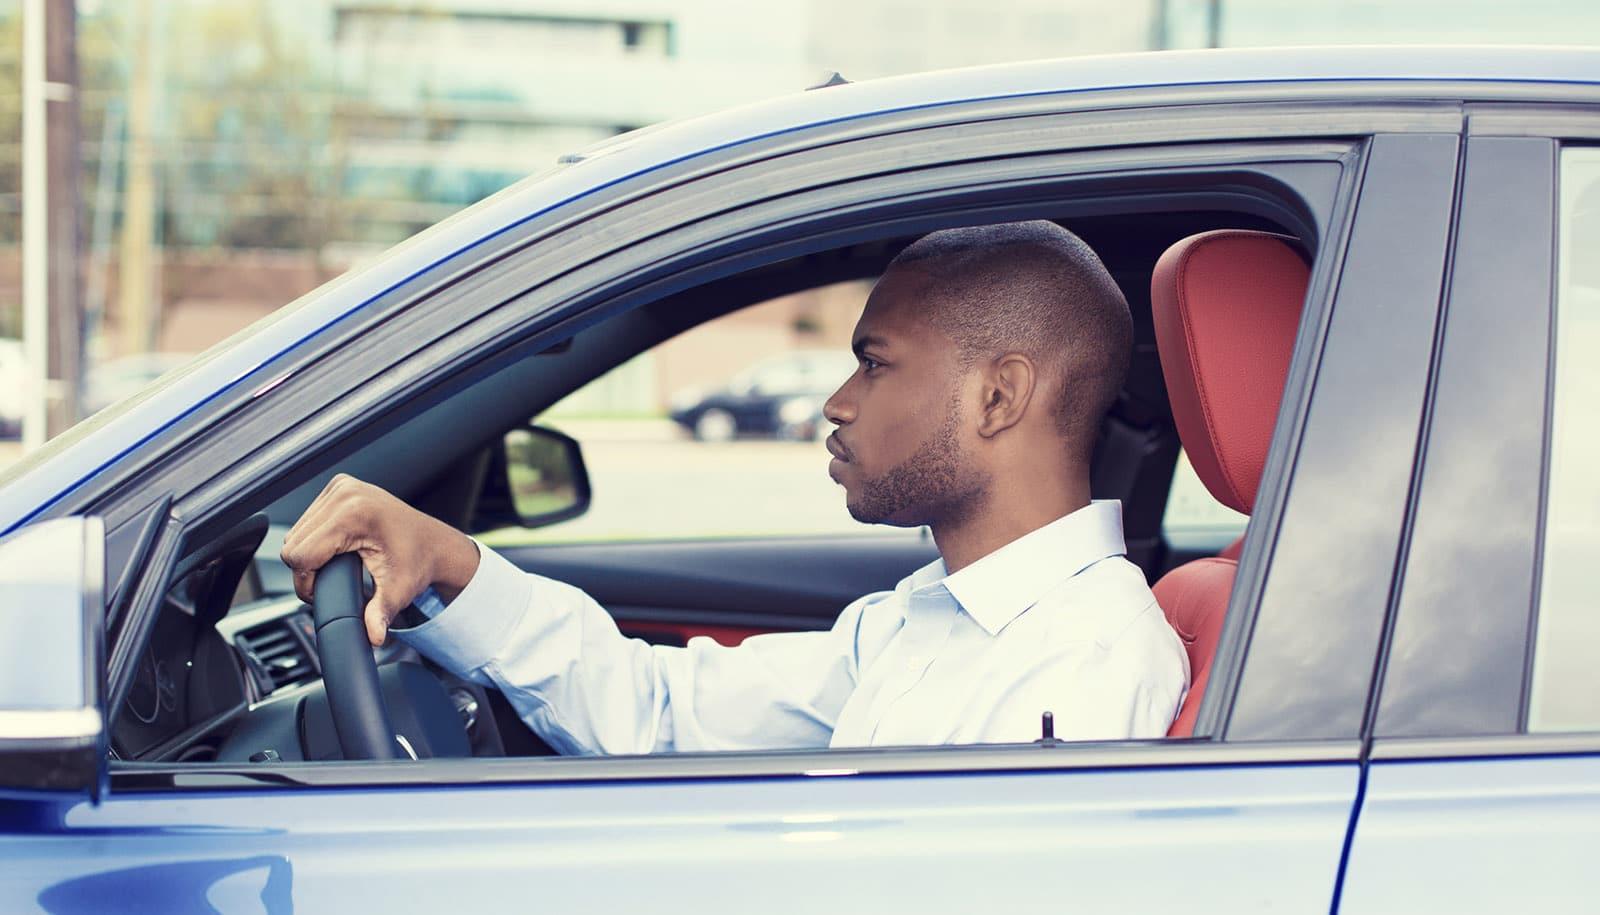 safe driving tips for christmas